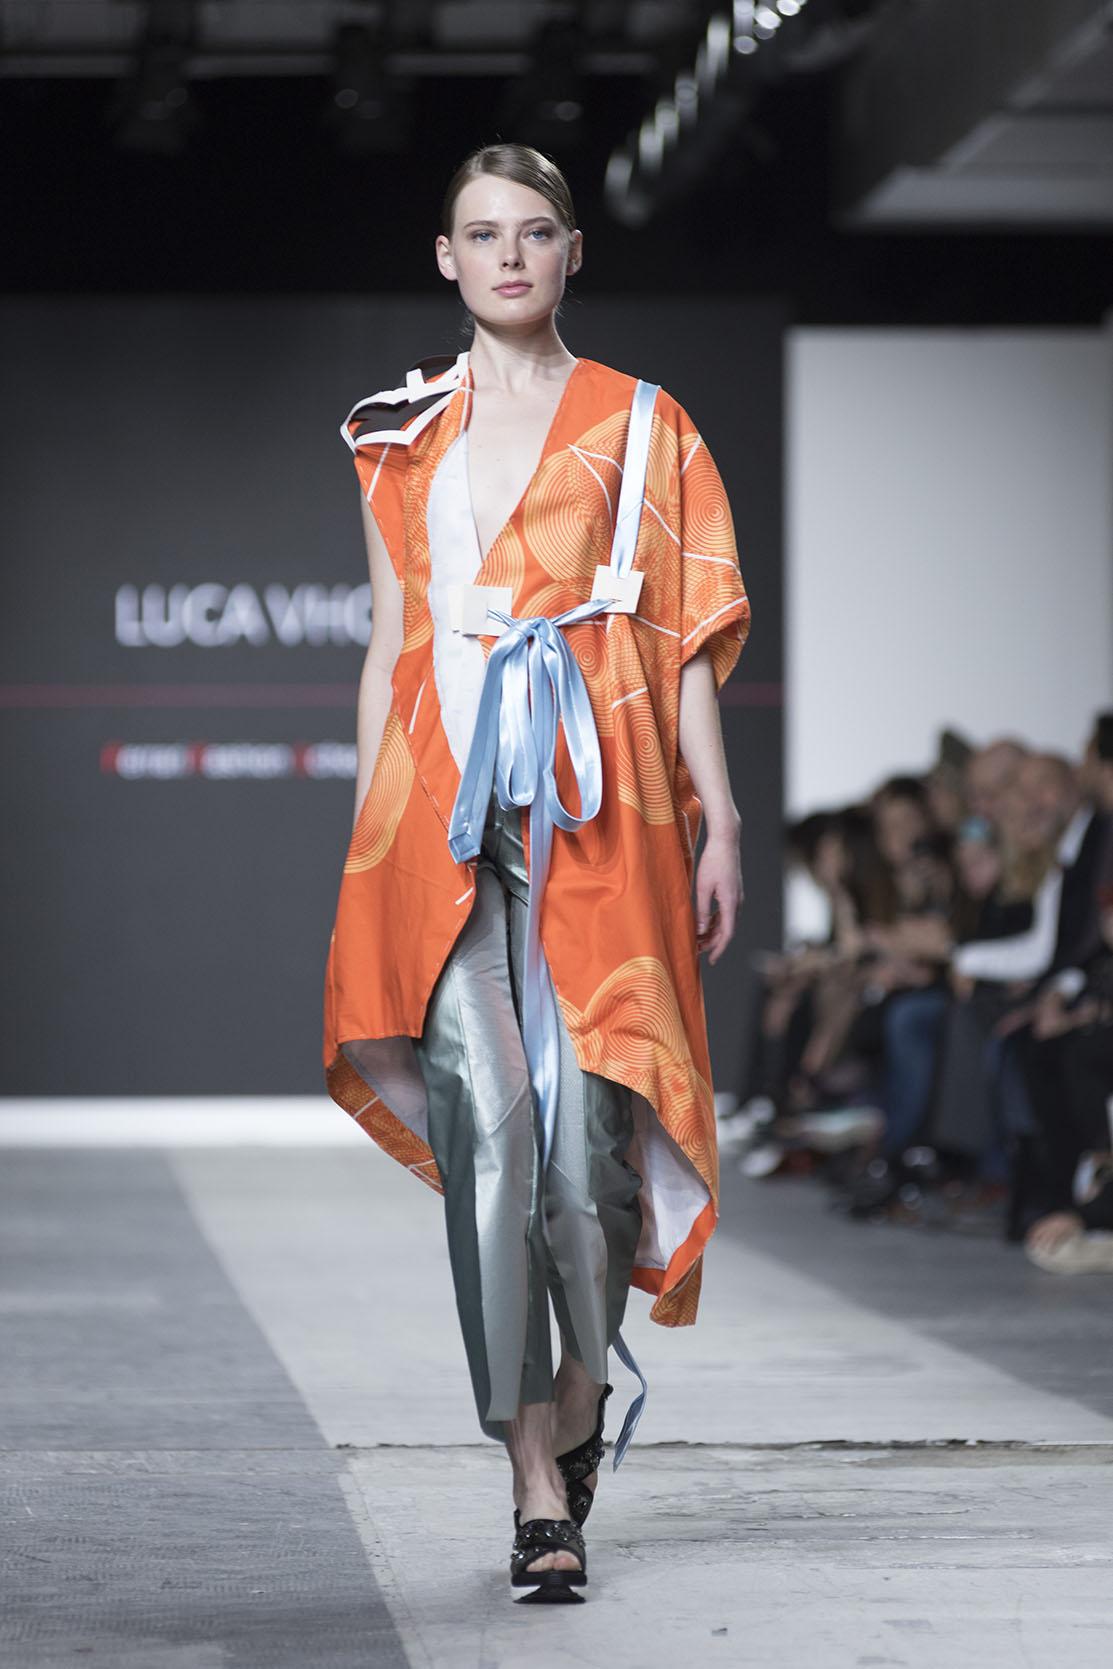 Fashion Designer: Luca Vho - Fashion Graduate Italia Fashion Show - Ferrari Fashion School